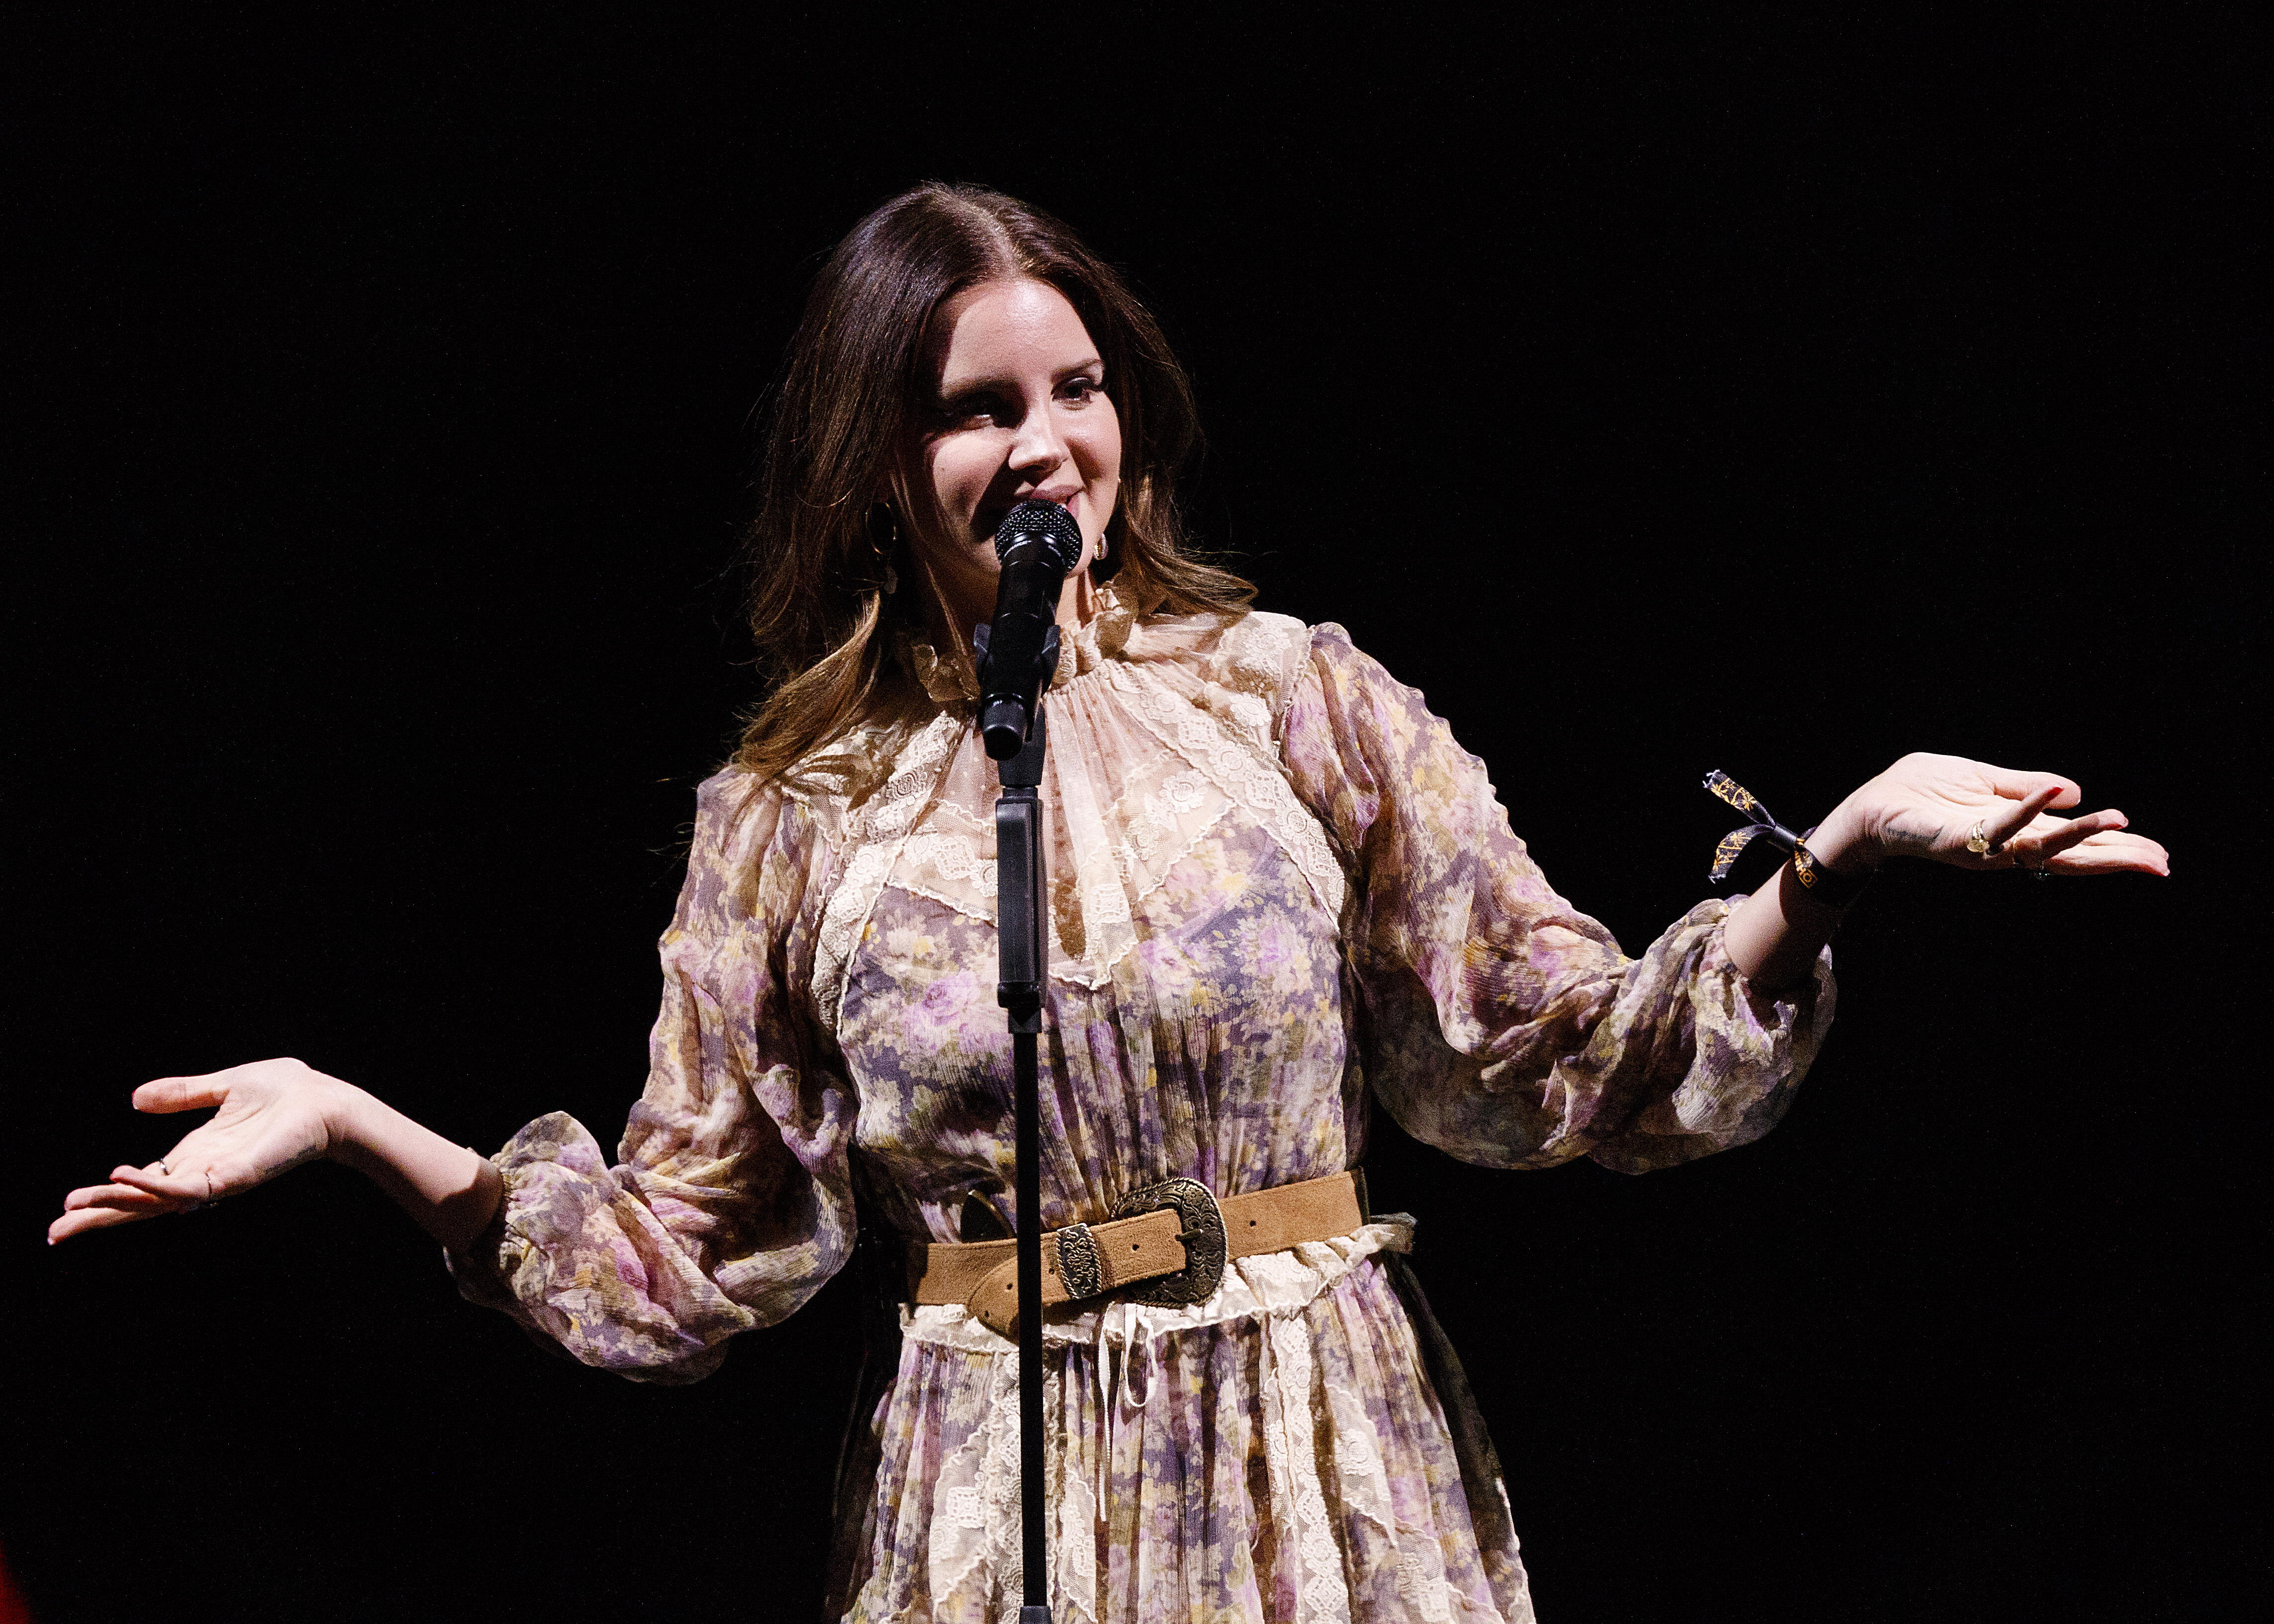 Lana Del Rey Performs At Rogers Arena